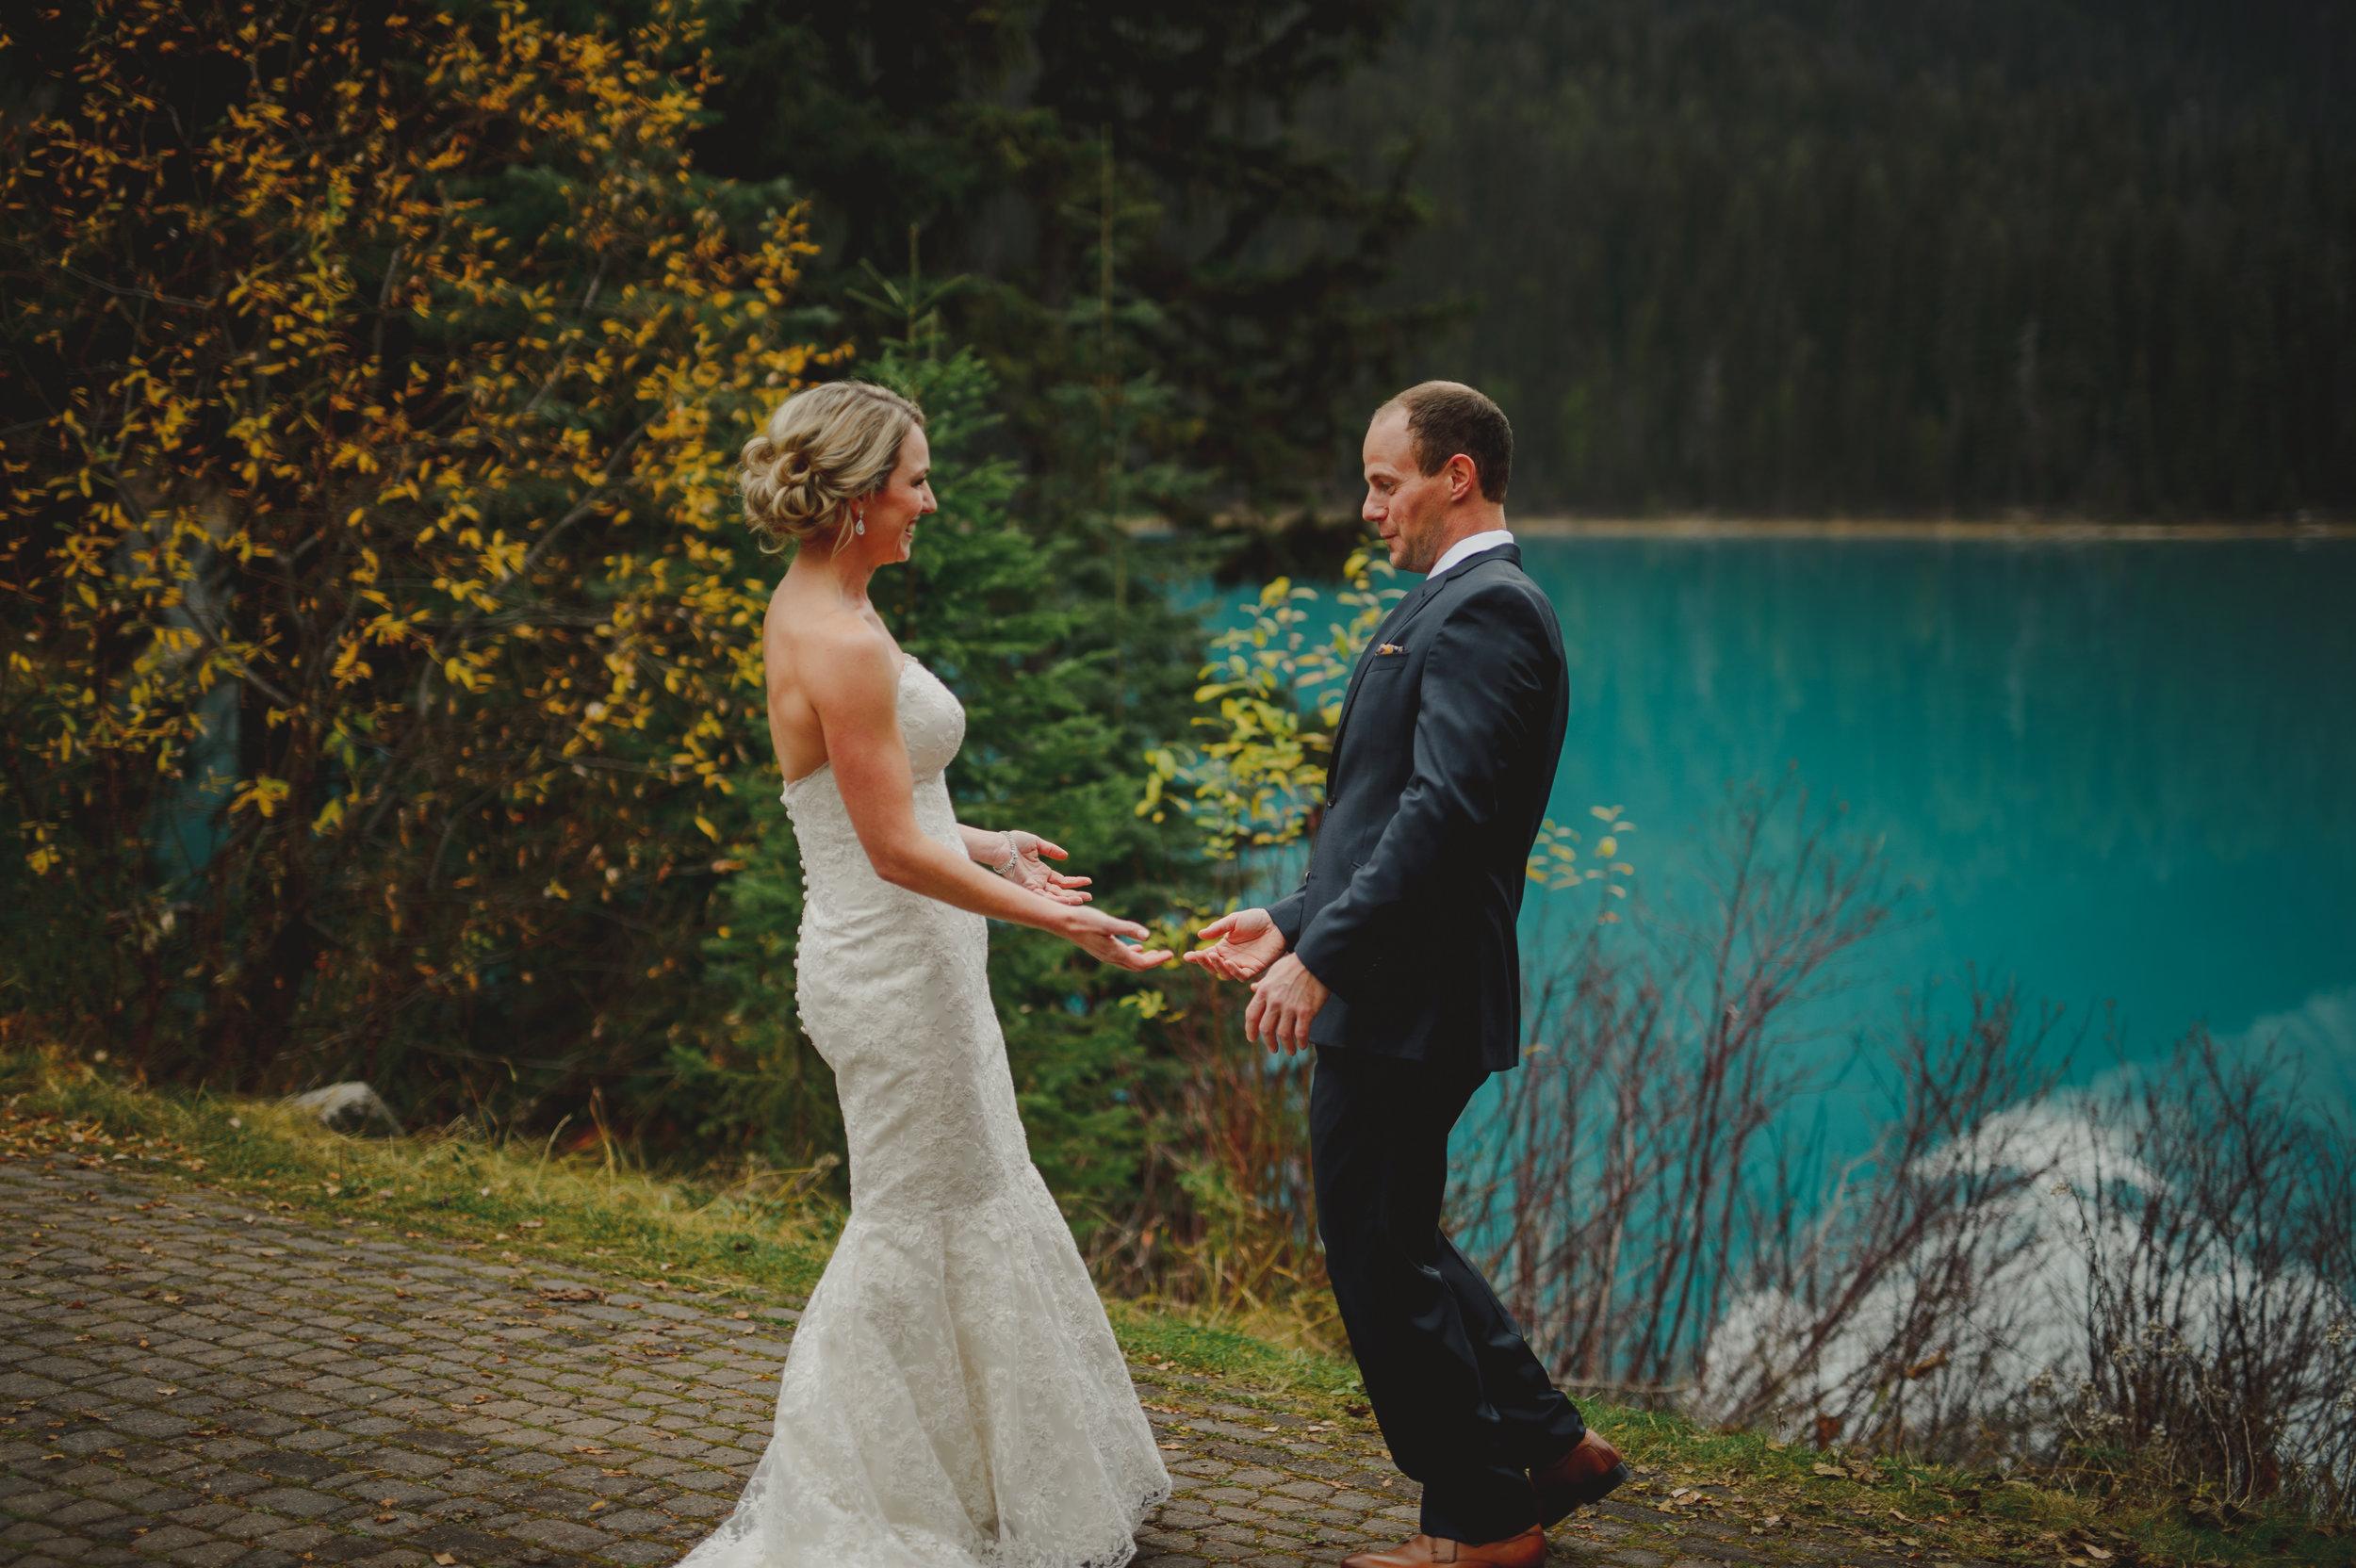 Banff-Wedding-Photographer-8.jpg